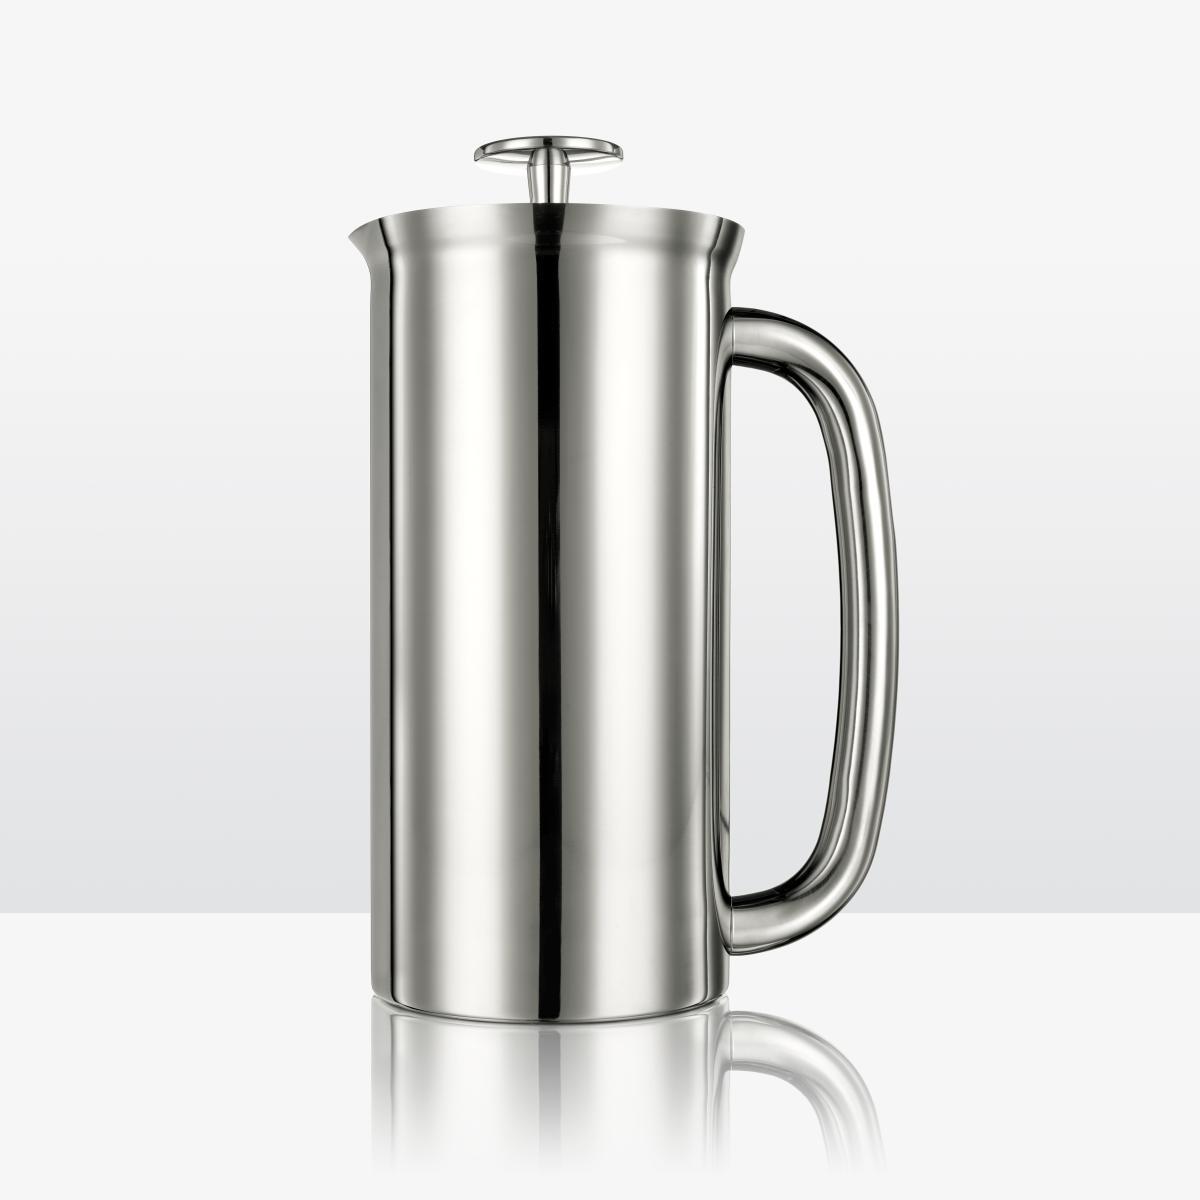 Espro P7 Press Kaffeezubereiter 550 mL Edelstahl poliert